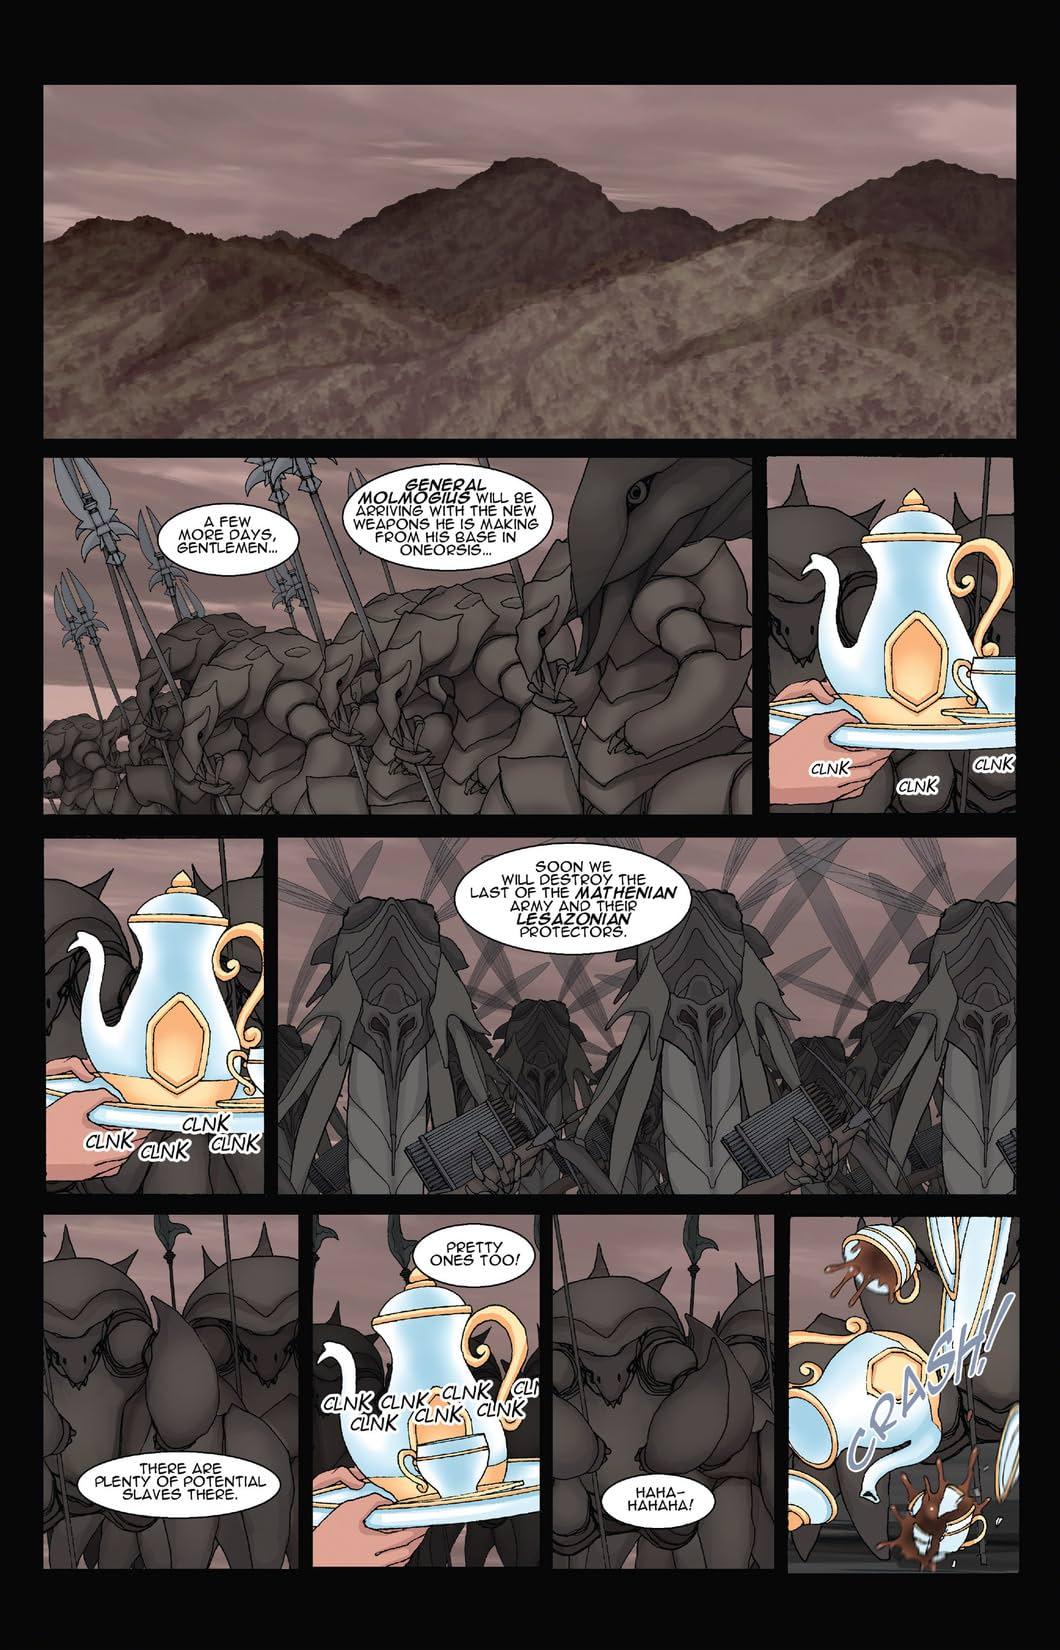 Neotopia Vol. 3 #4: The Kingdoms Beyond